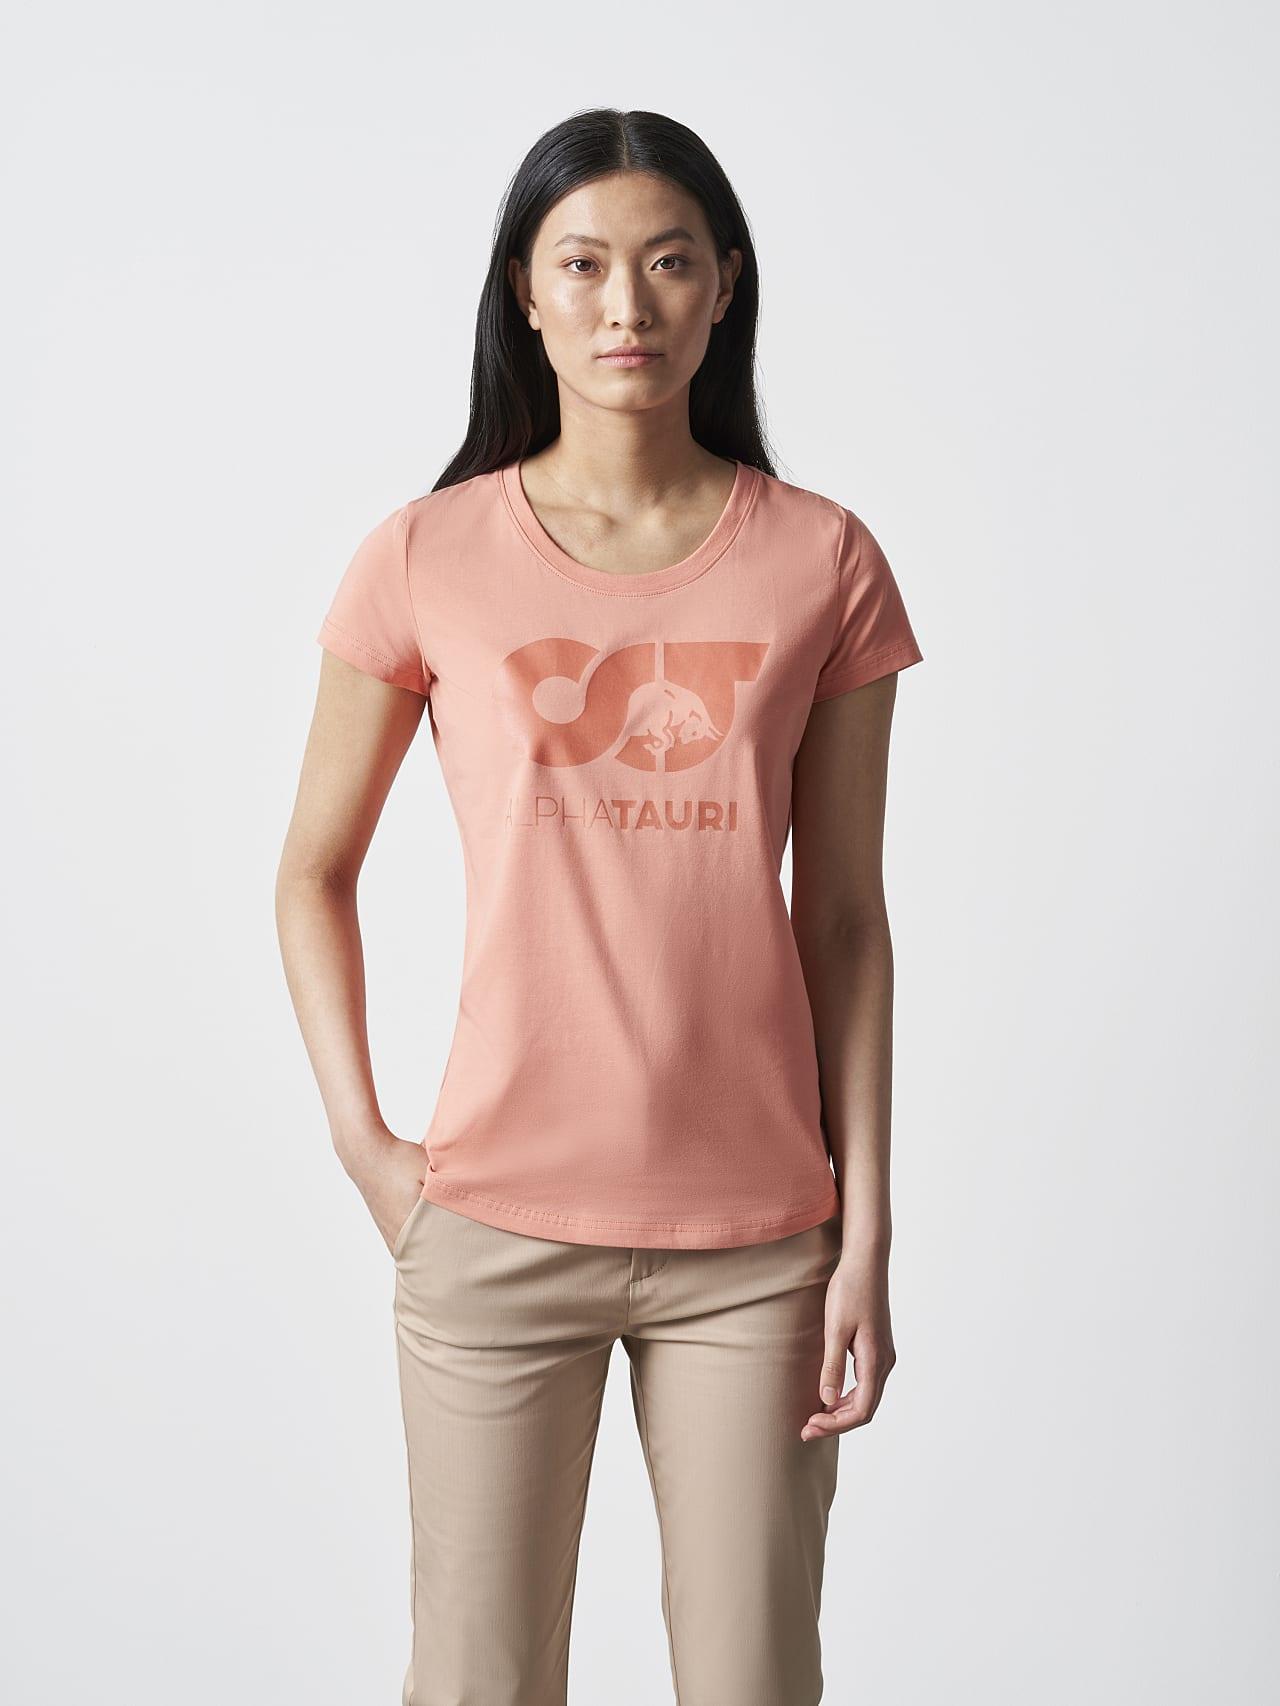 JERU V2.Y4.02 Signature Logo T-Shirt coral Model shot Alpha Tauri